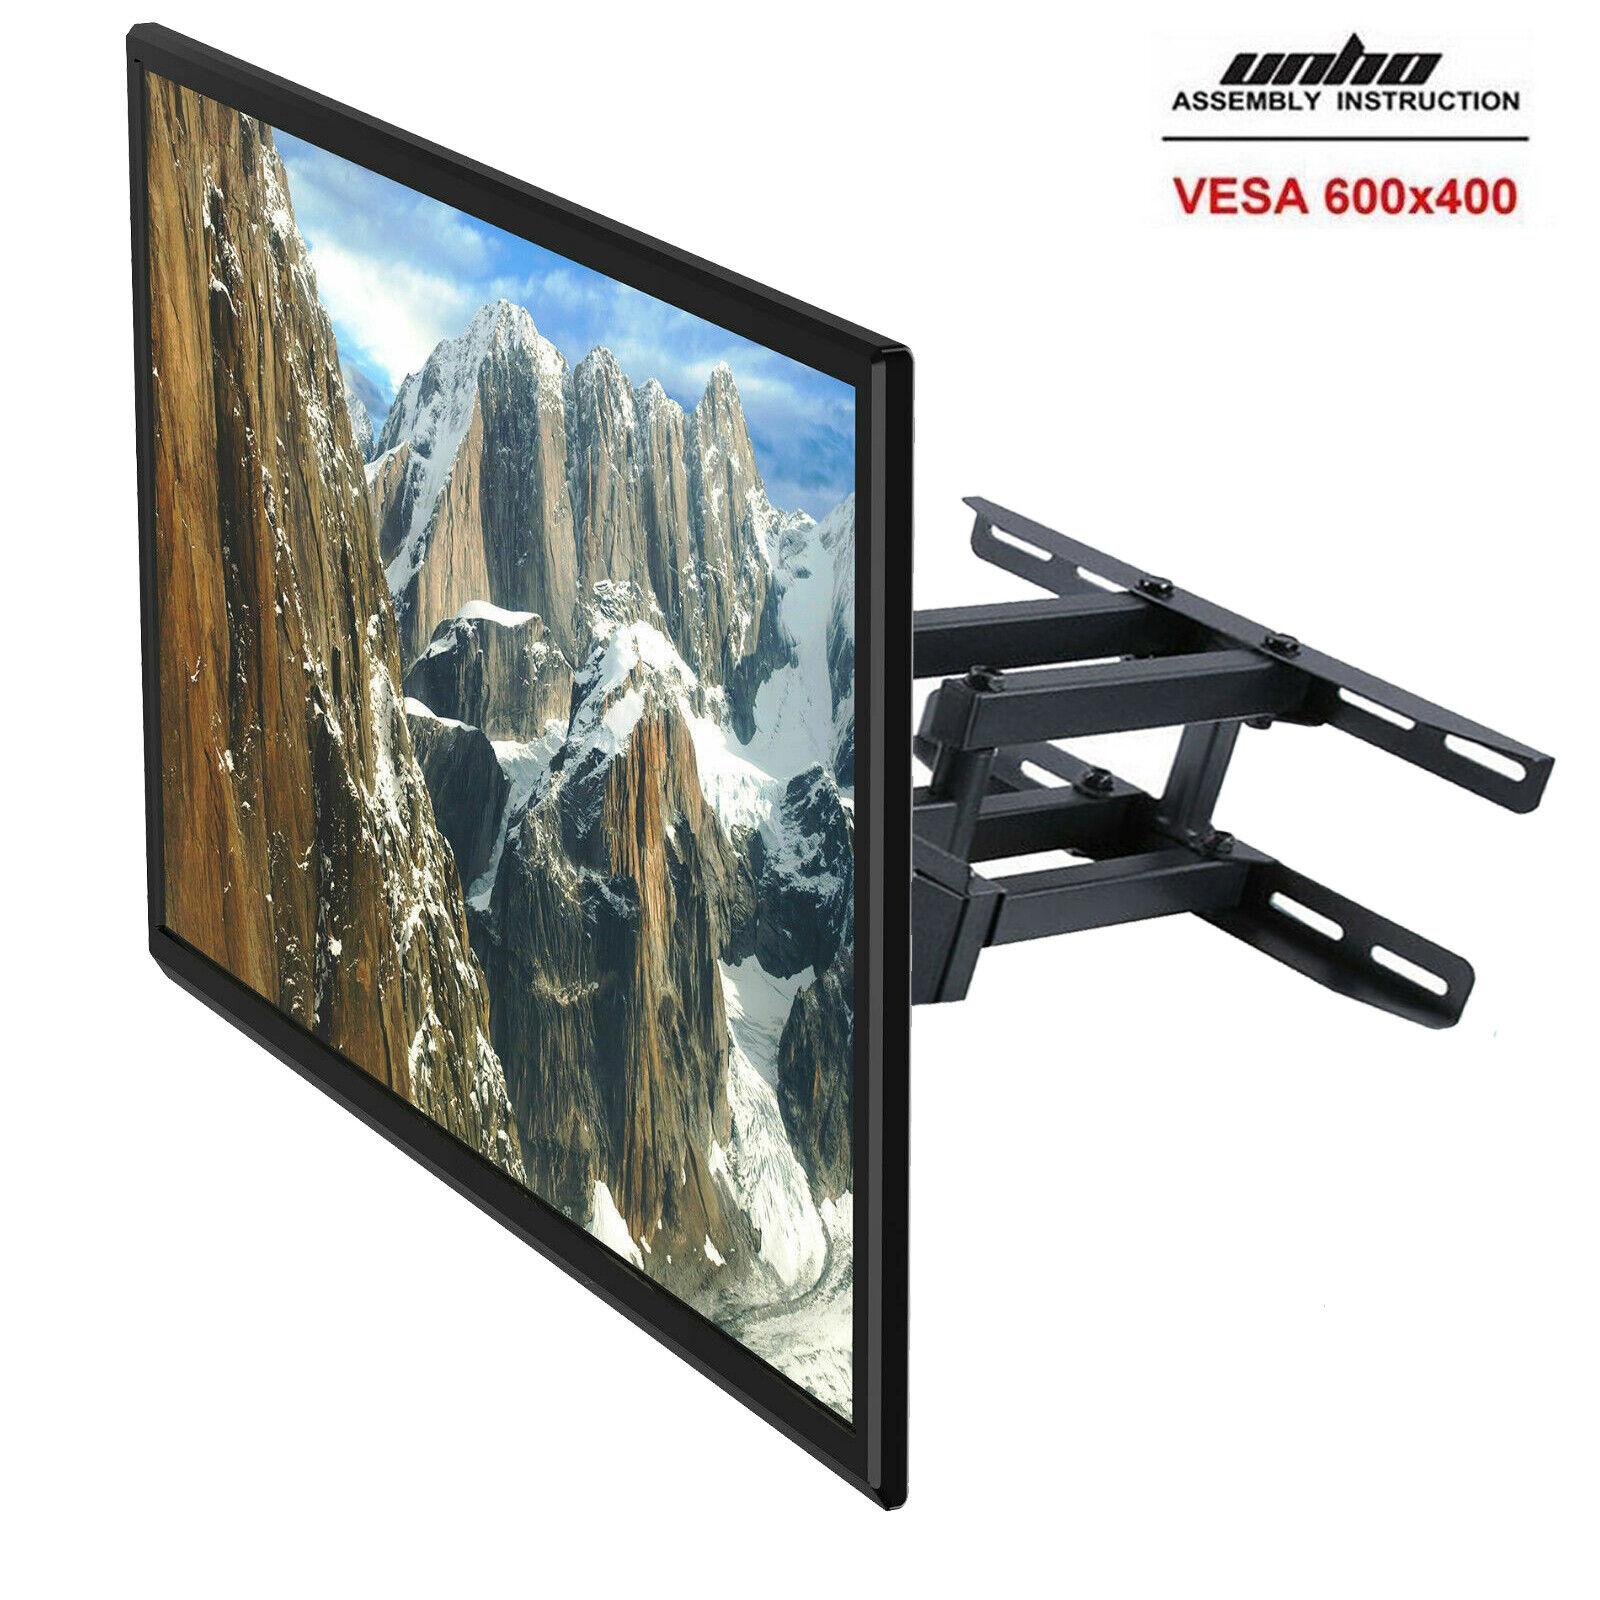 HEAVY DUTY DUAL ARM FULL MOTION TILT TV WALL MOUNT BRACKET 3270 FOR MOST MODEL